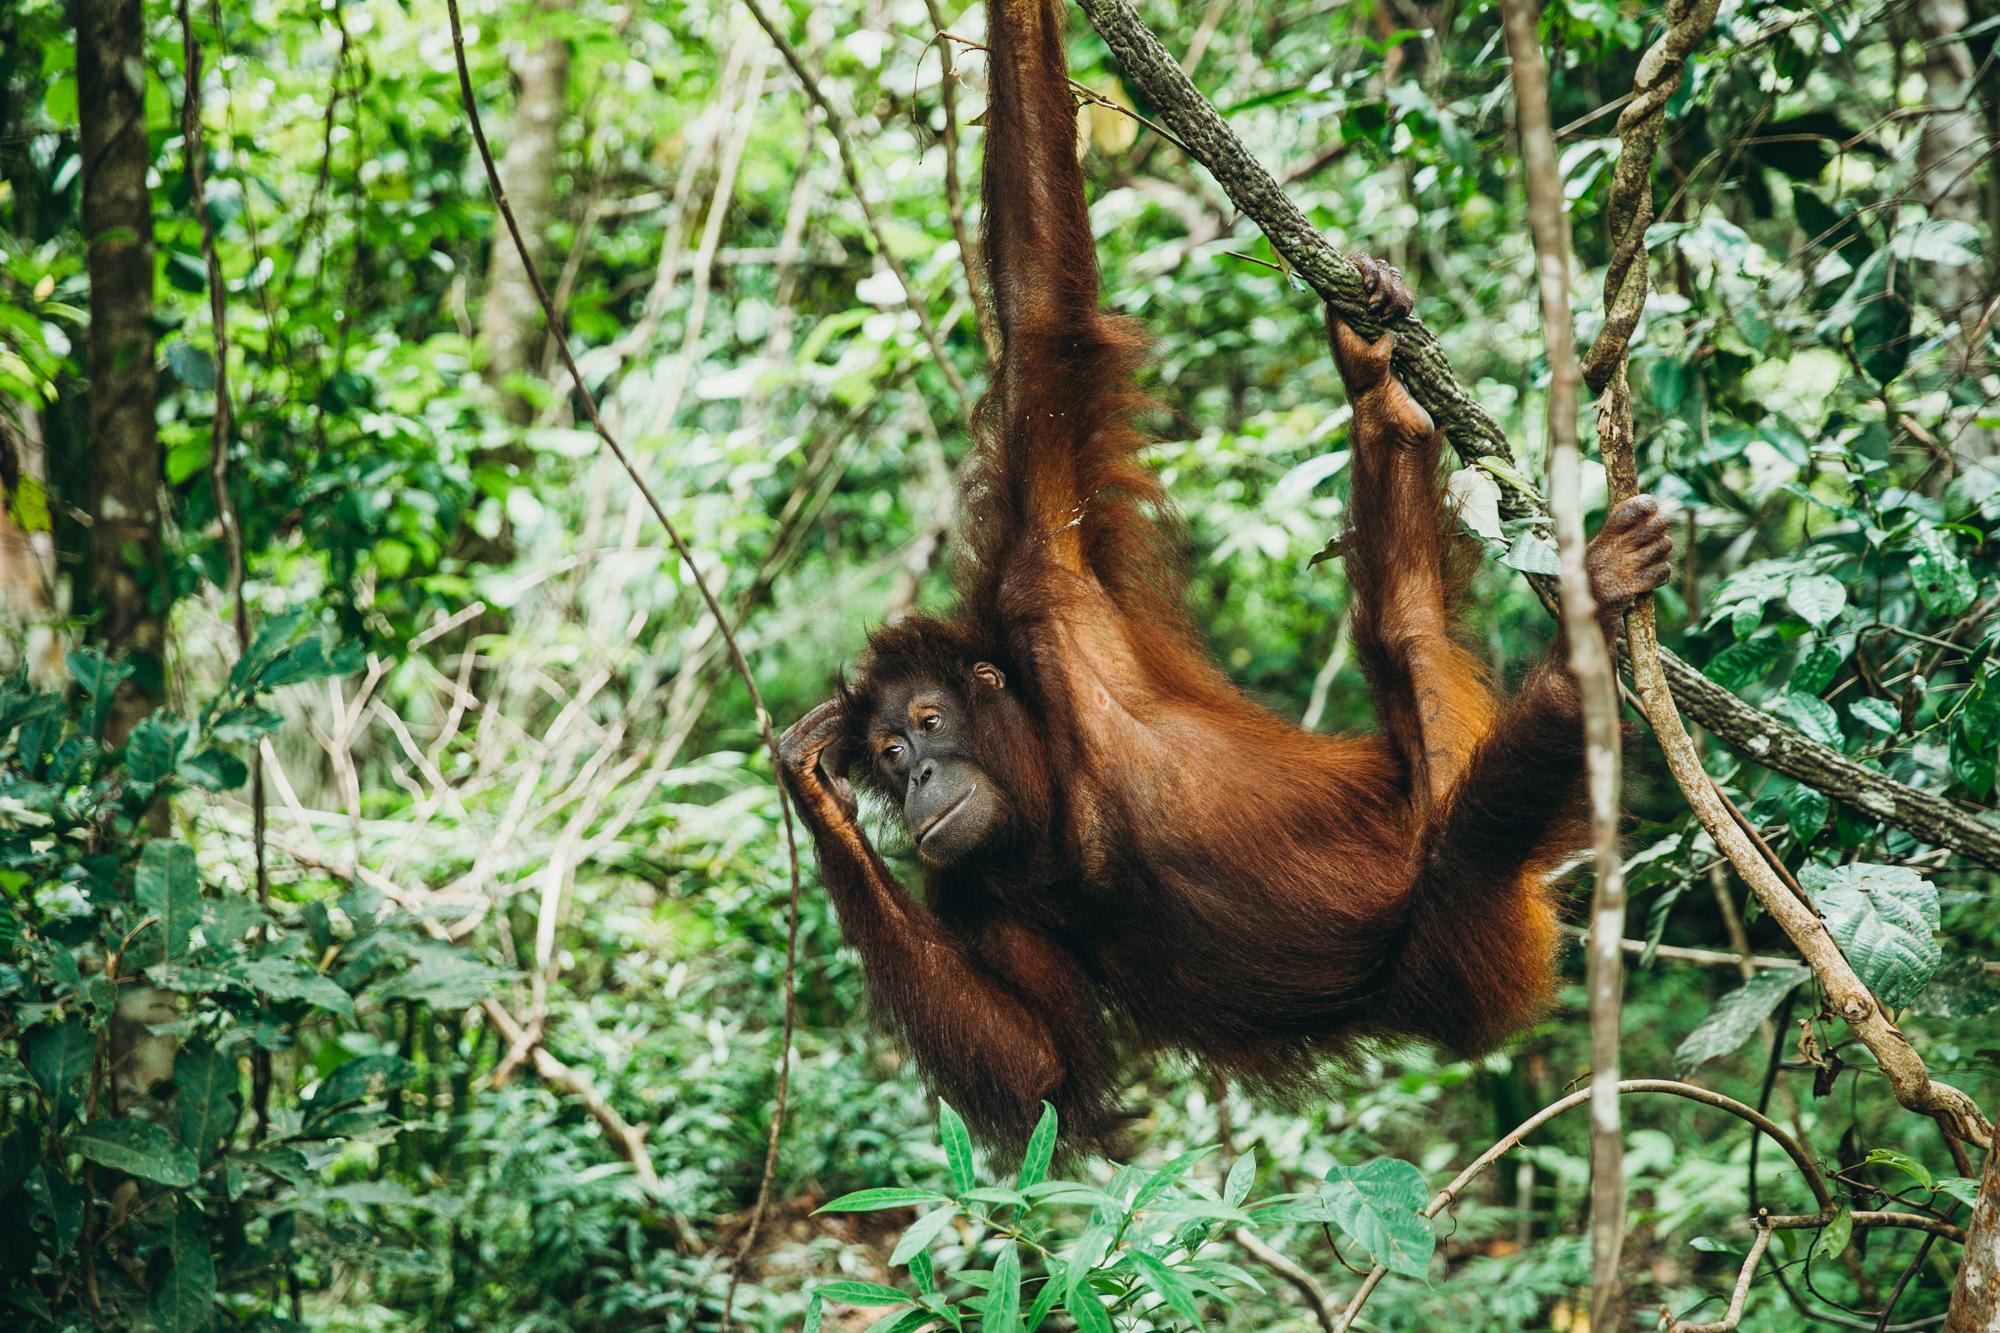 Borneo_HBGOODIE2018 (38 of 38).jpg